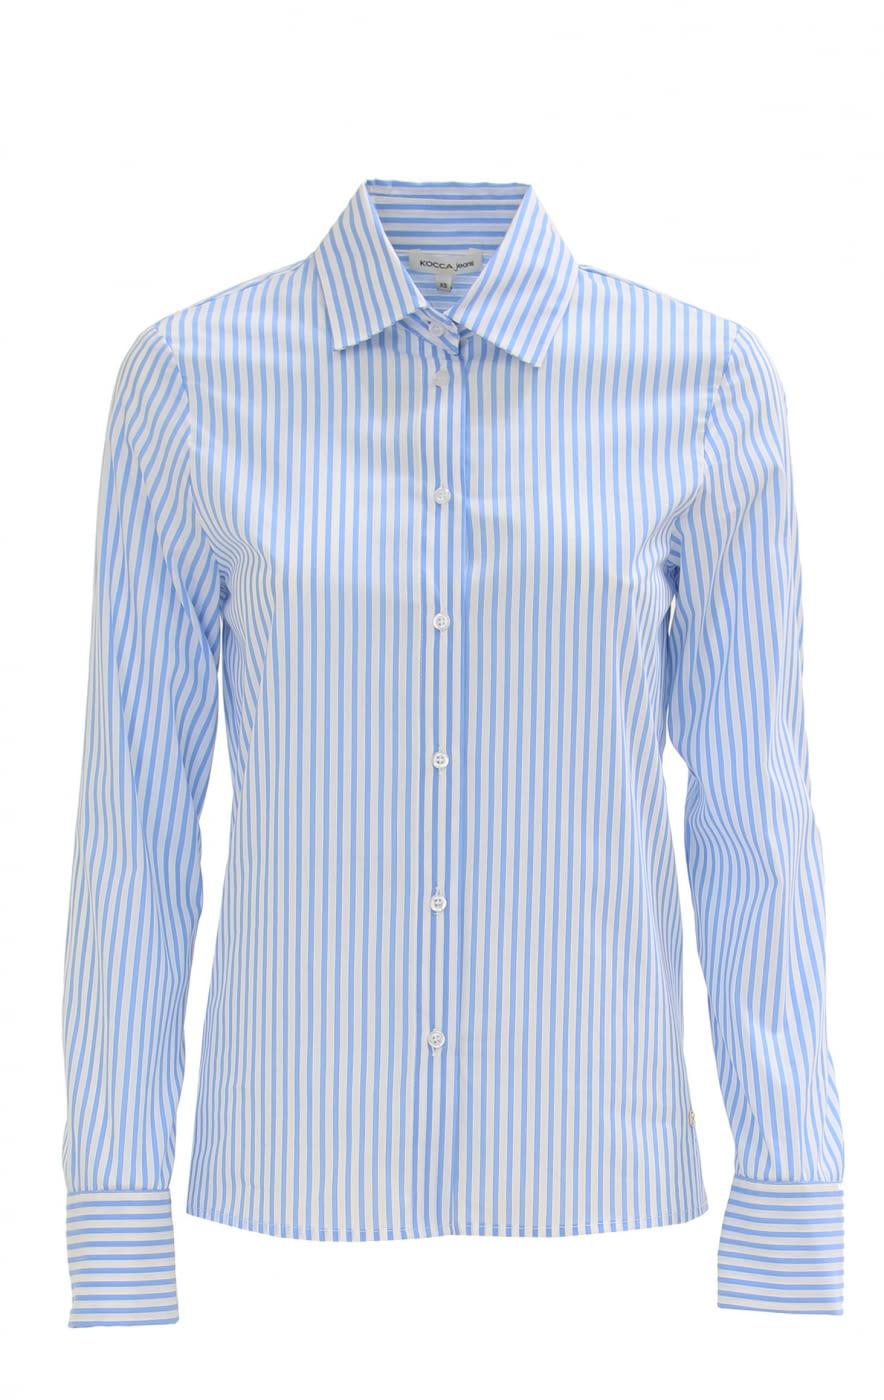 KOCCA camisa algodón rayas blanco y celeste